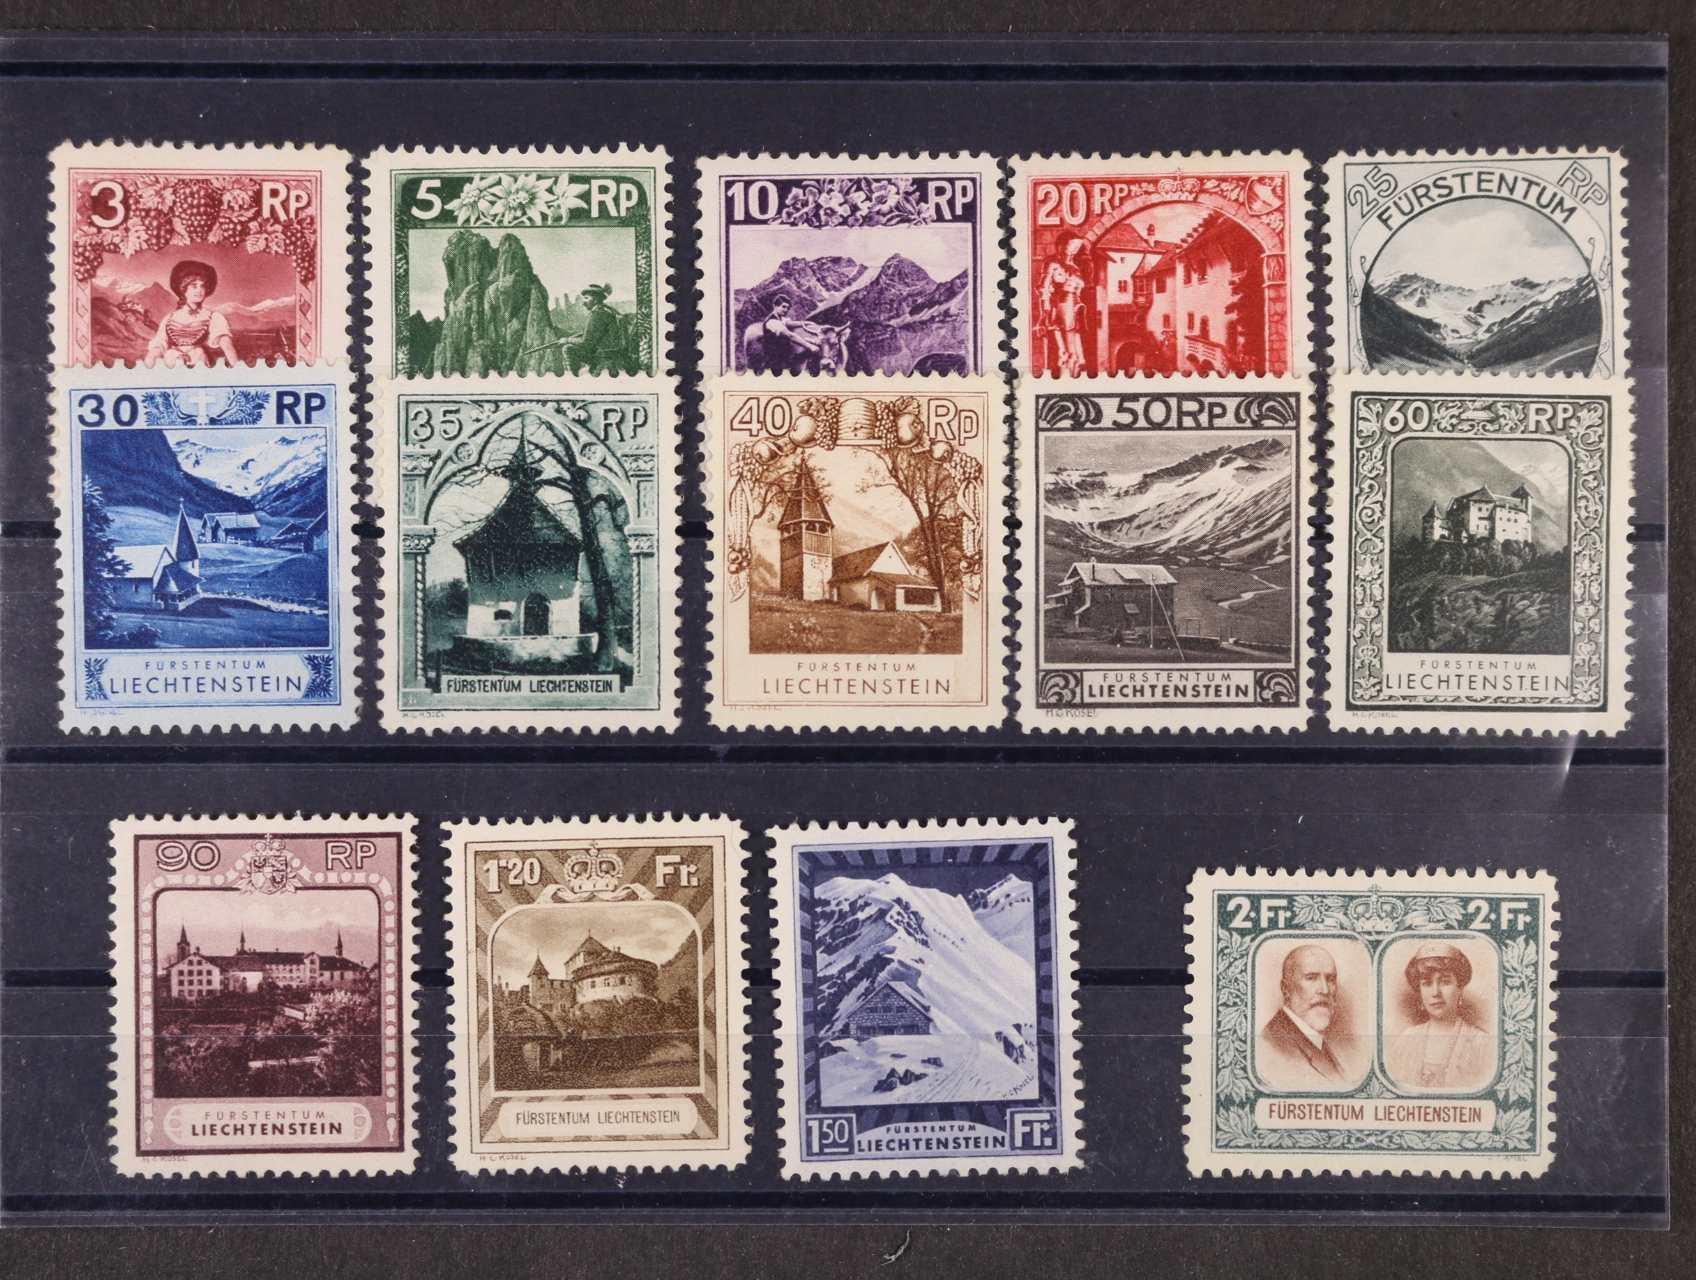 zn. Mi. č. 94 - 107, lux. kvalita, 2000 EUR